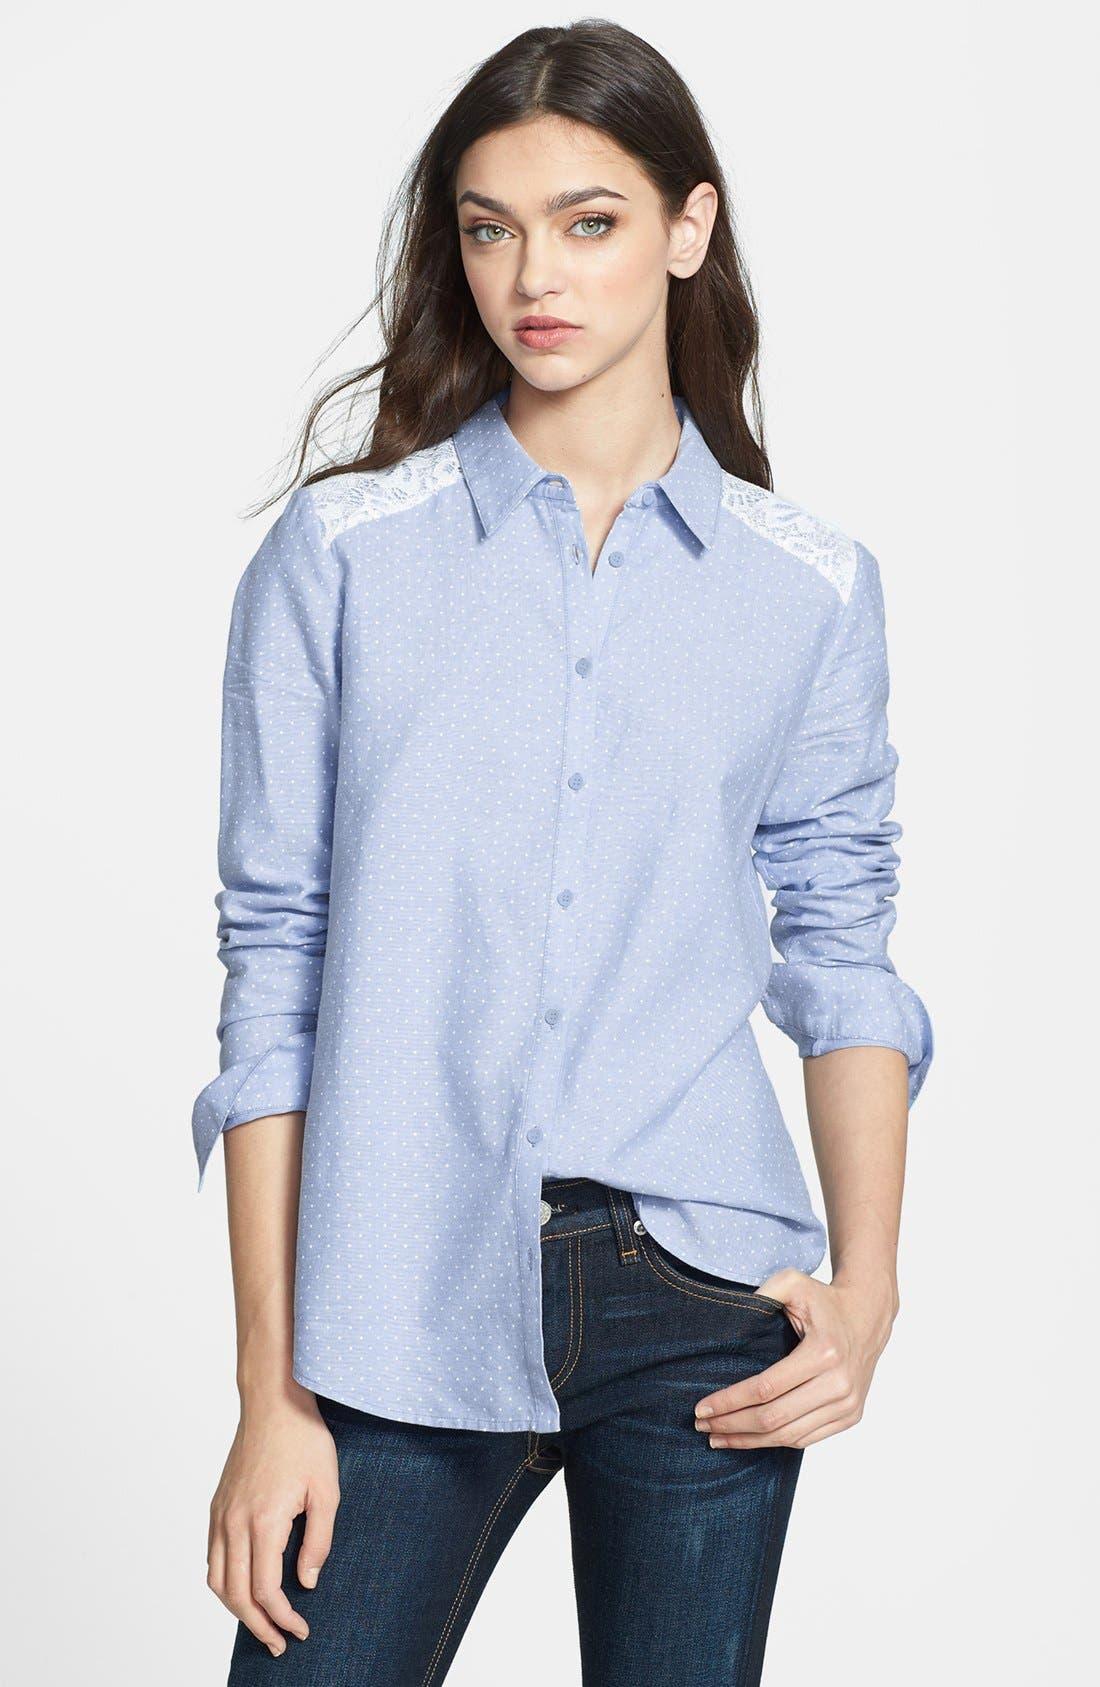 Alternate Image 1 Selected - Hinge® Lace Yoke Dot Print Shirt